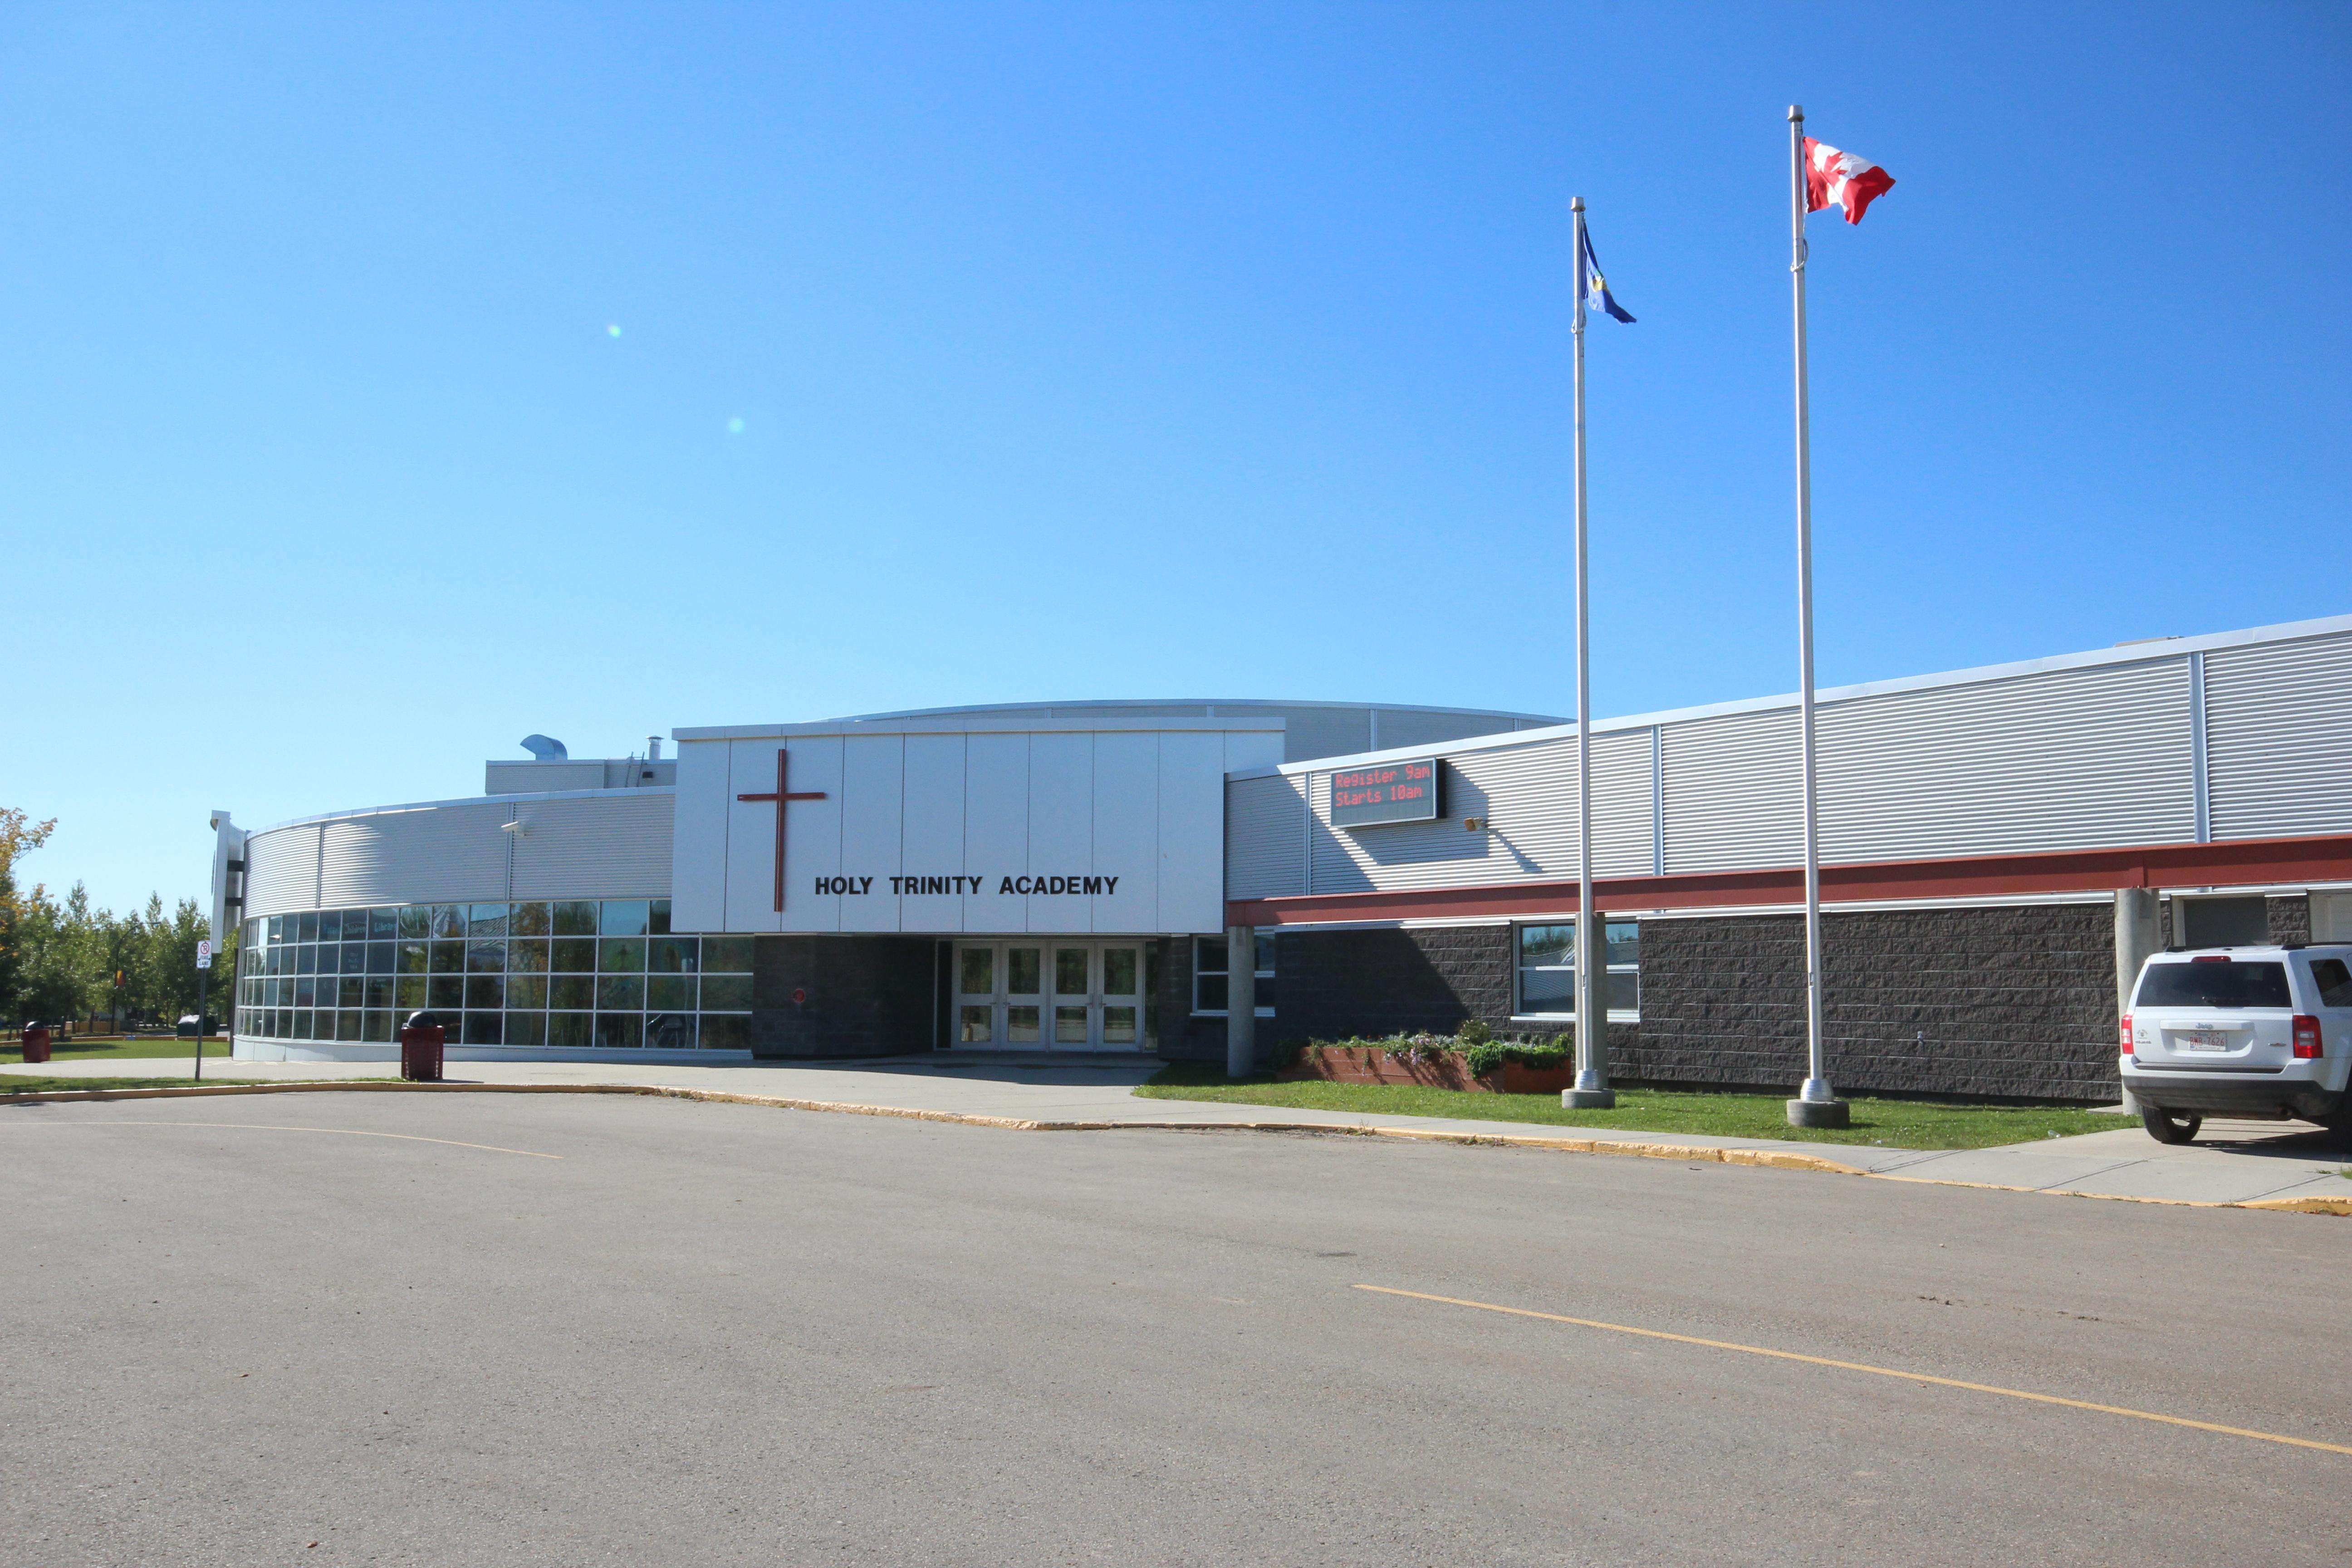 Holy Trinity Academy